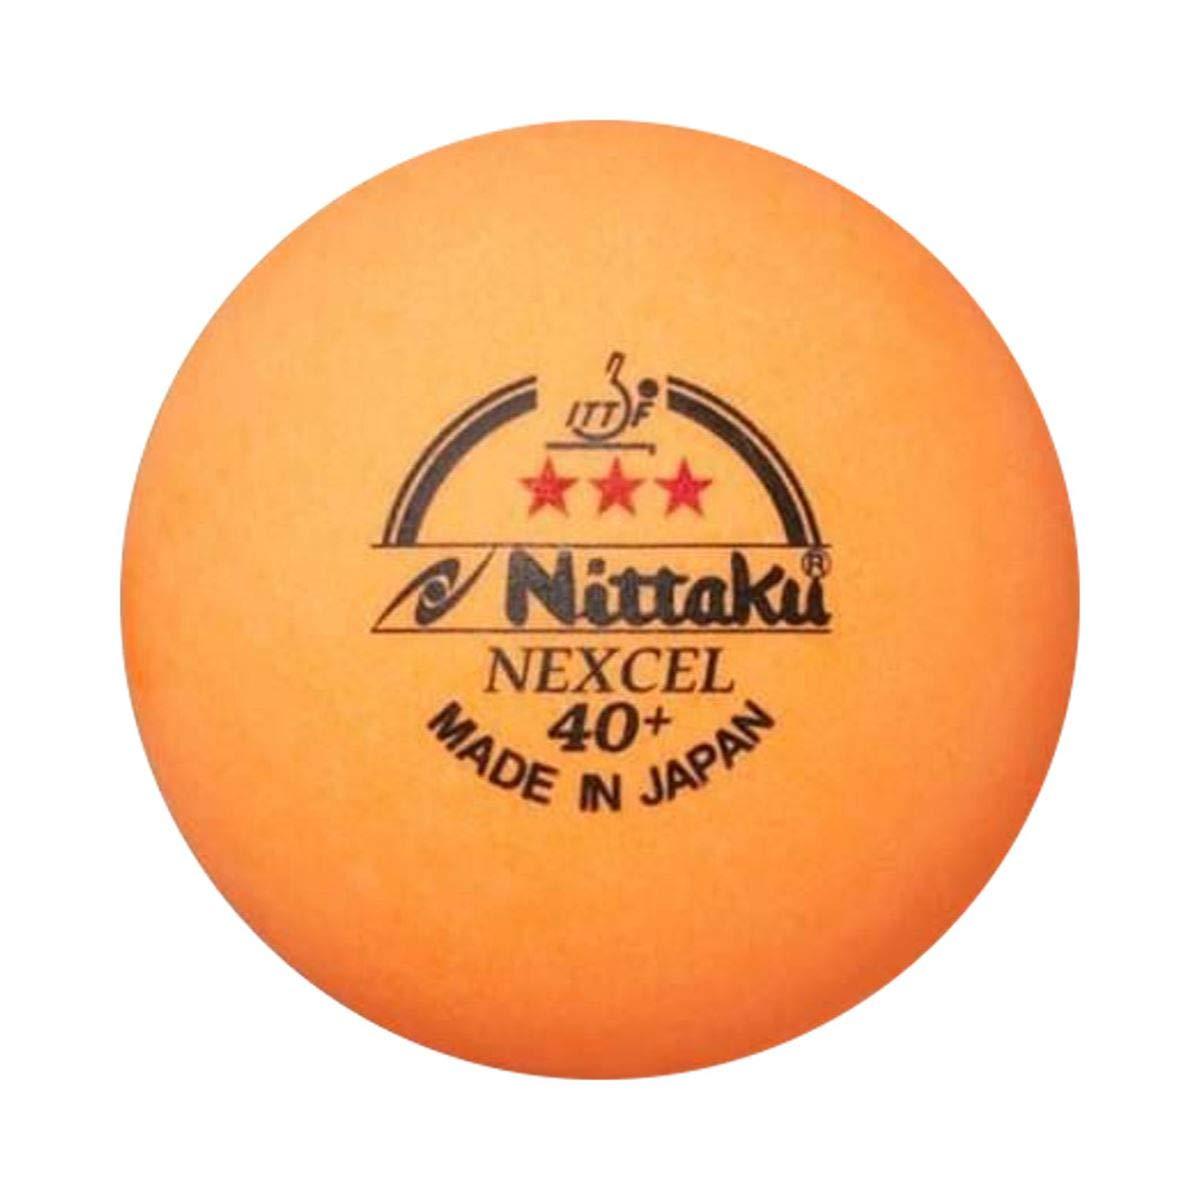 12 Pelotas de Ping Pong 3 Estrellas NITTAKU Made in Japan